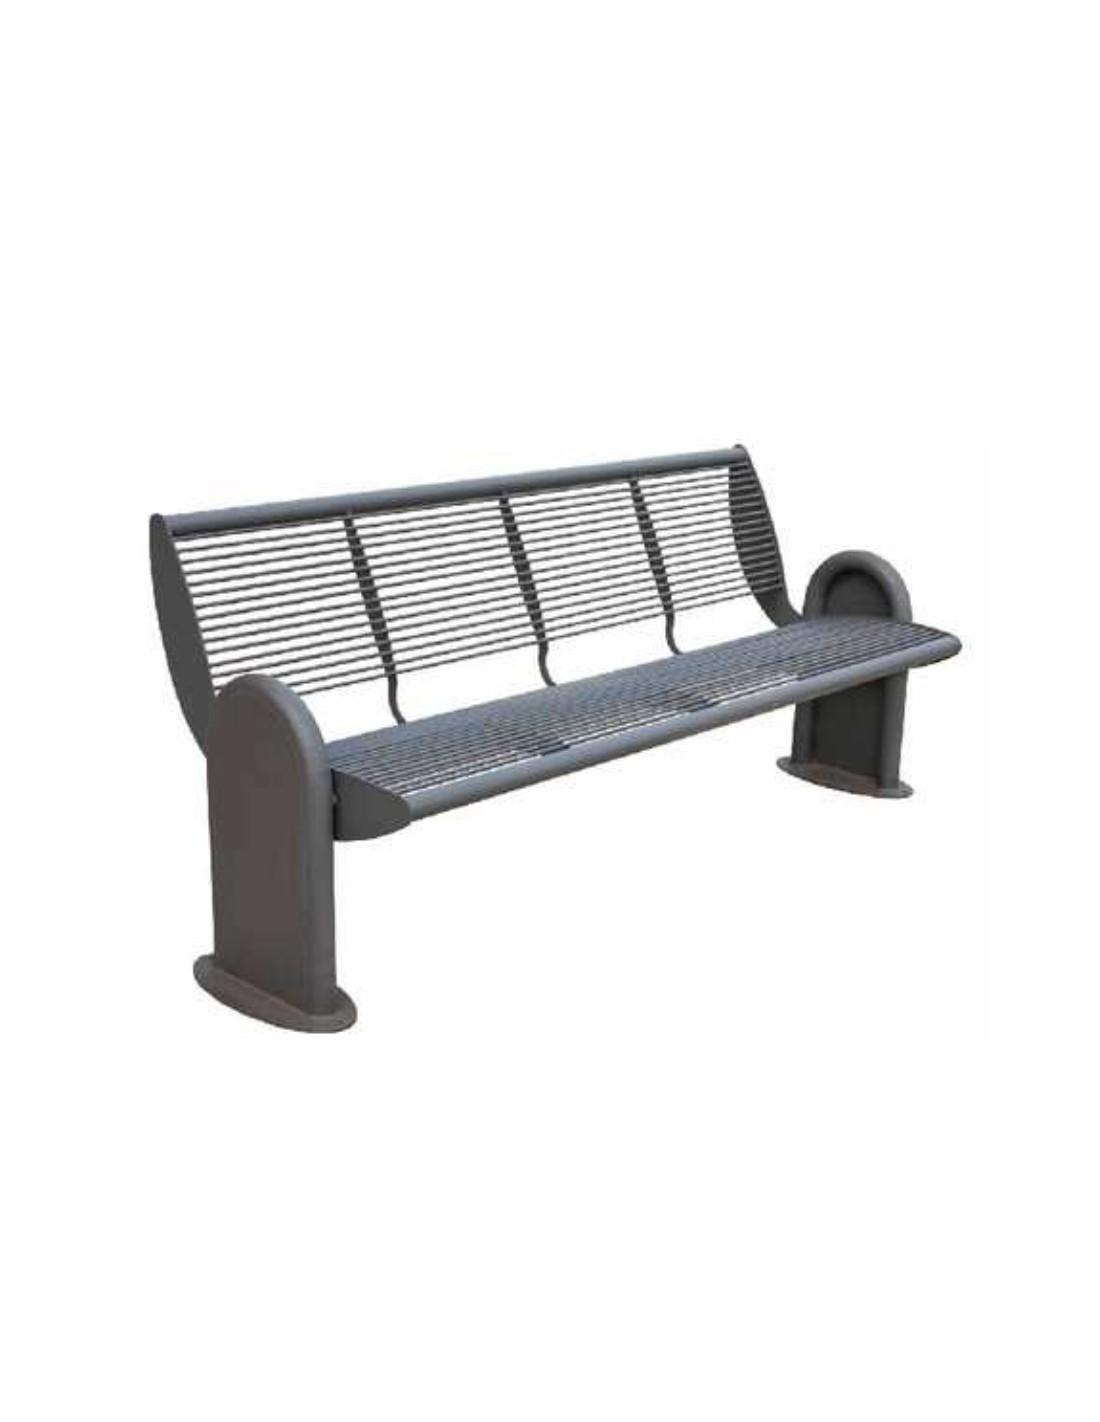 banc acier esira le mobilier urbain. Black Bedroom Furniture Sets. Home Design Ideas